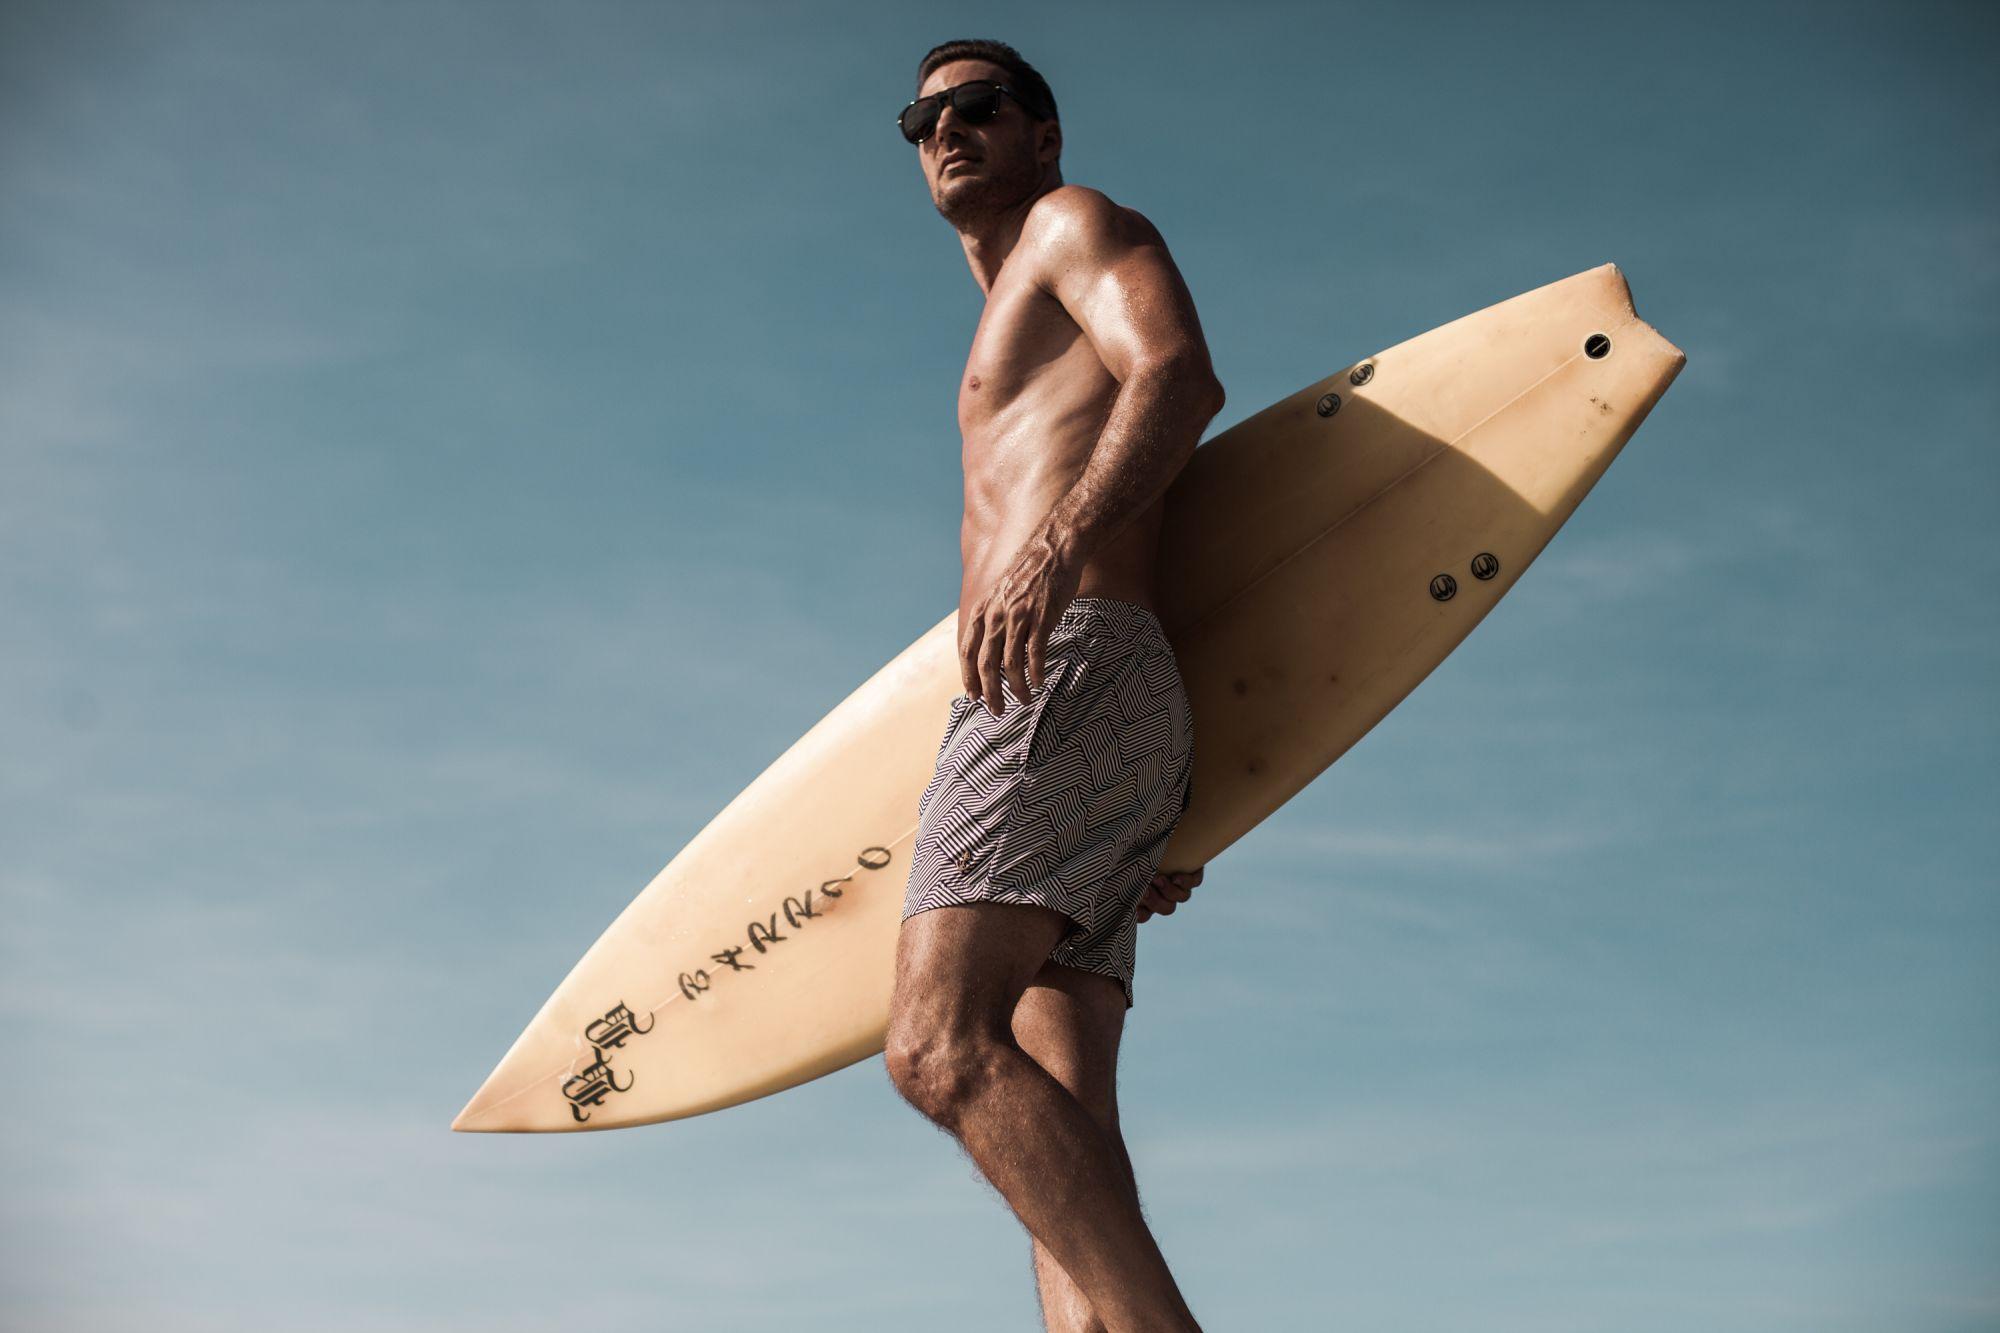 10 Luxury Swim Trunks Every Man Needs